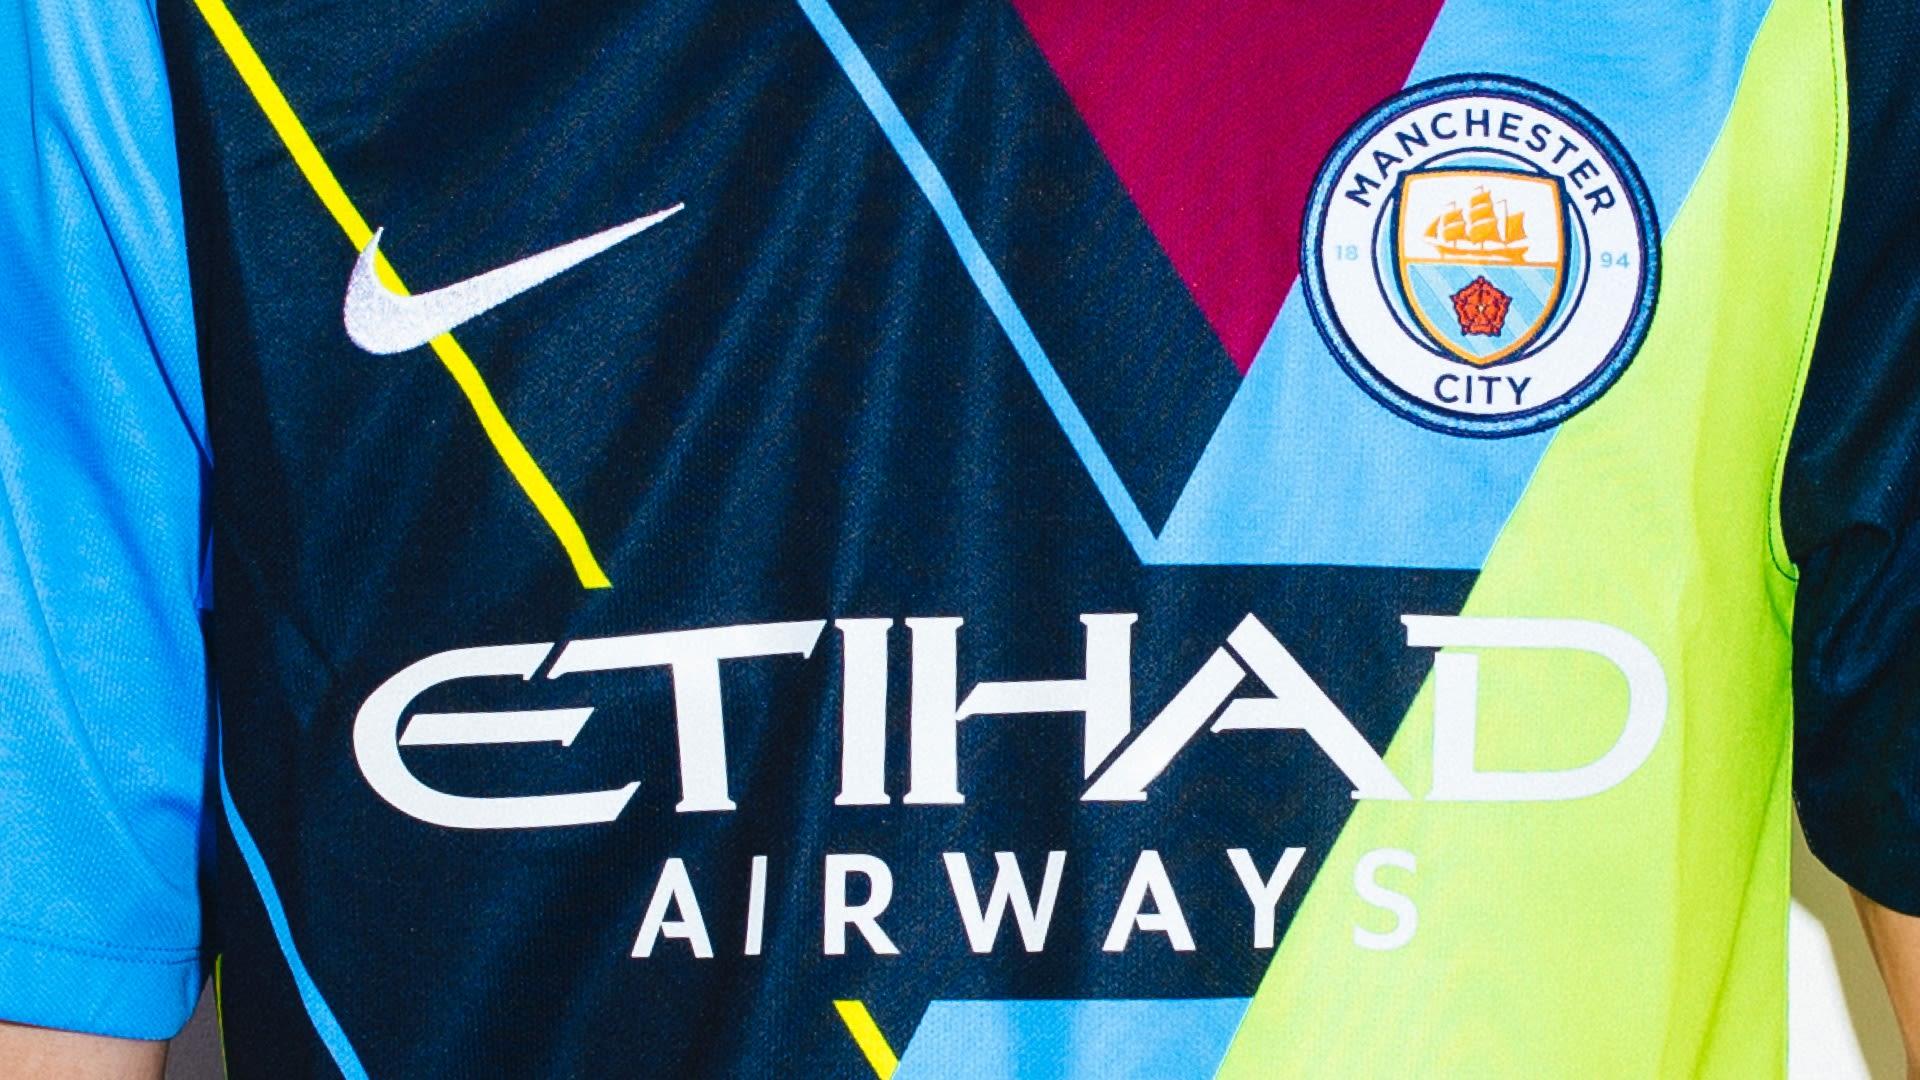 detailed look b5da5 6789f Manchester City, Mashup Jersey, Phil Foden. Nike.com FI